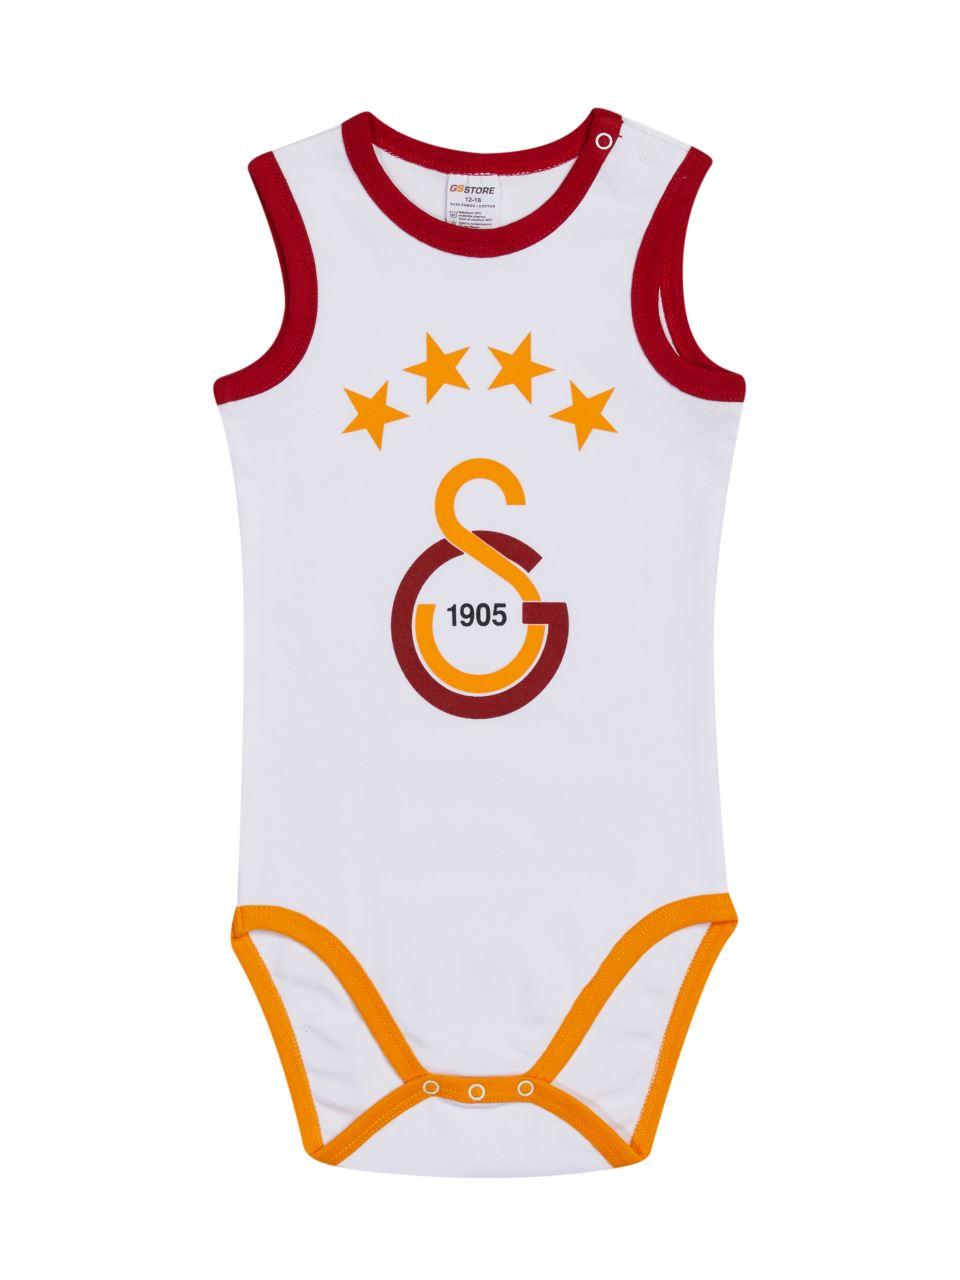 Galatasaray Bebek Atlet Body B191010